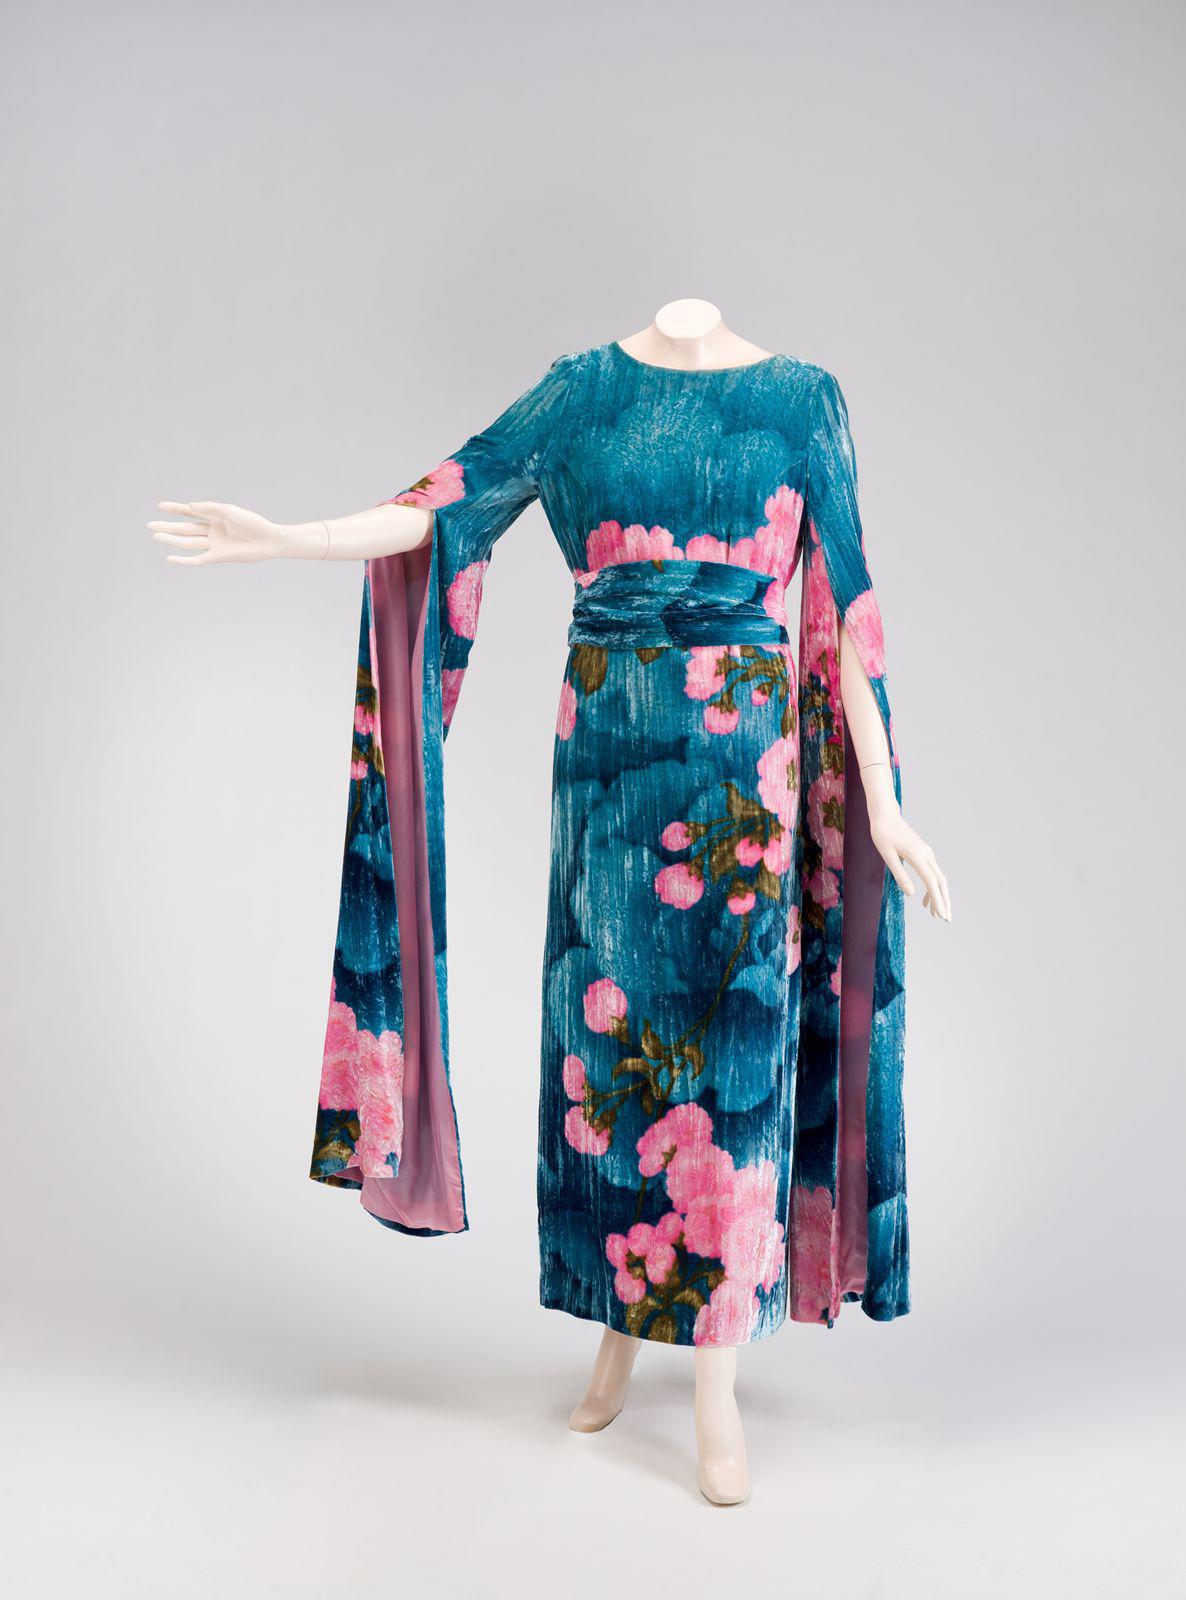 Hanae Mori, la primera diseñadora asiática de alta costura